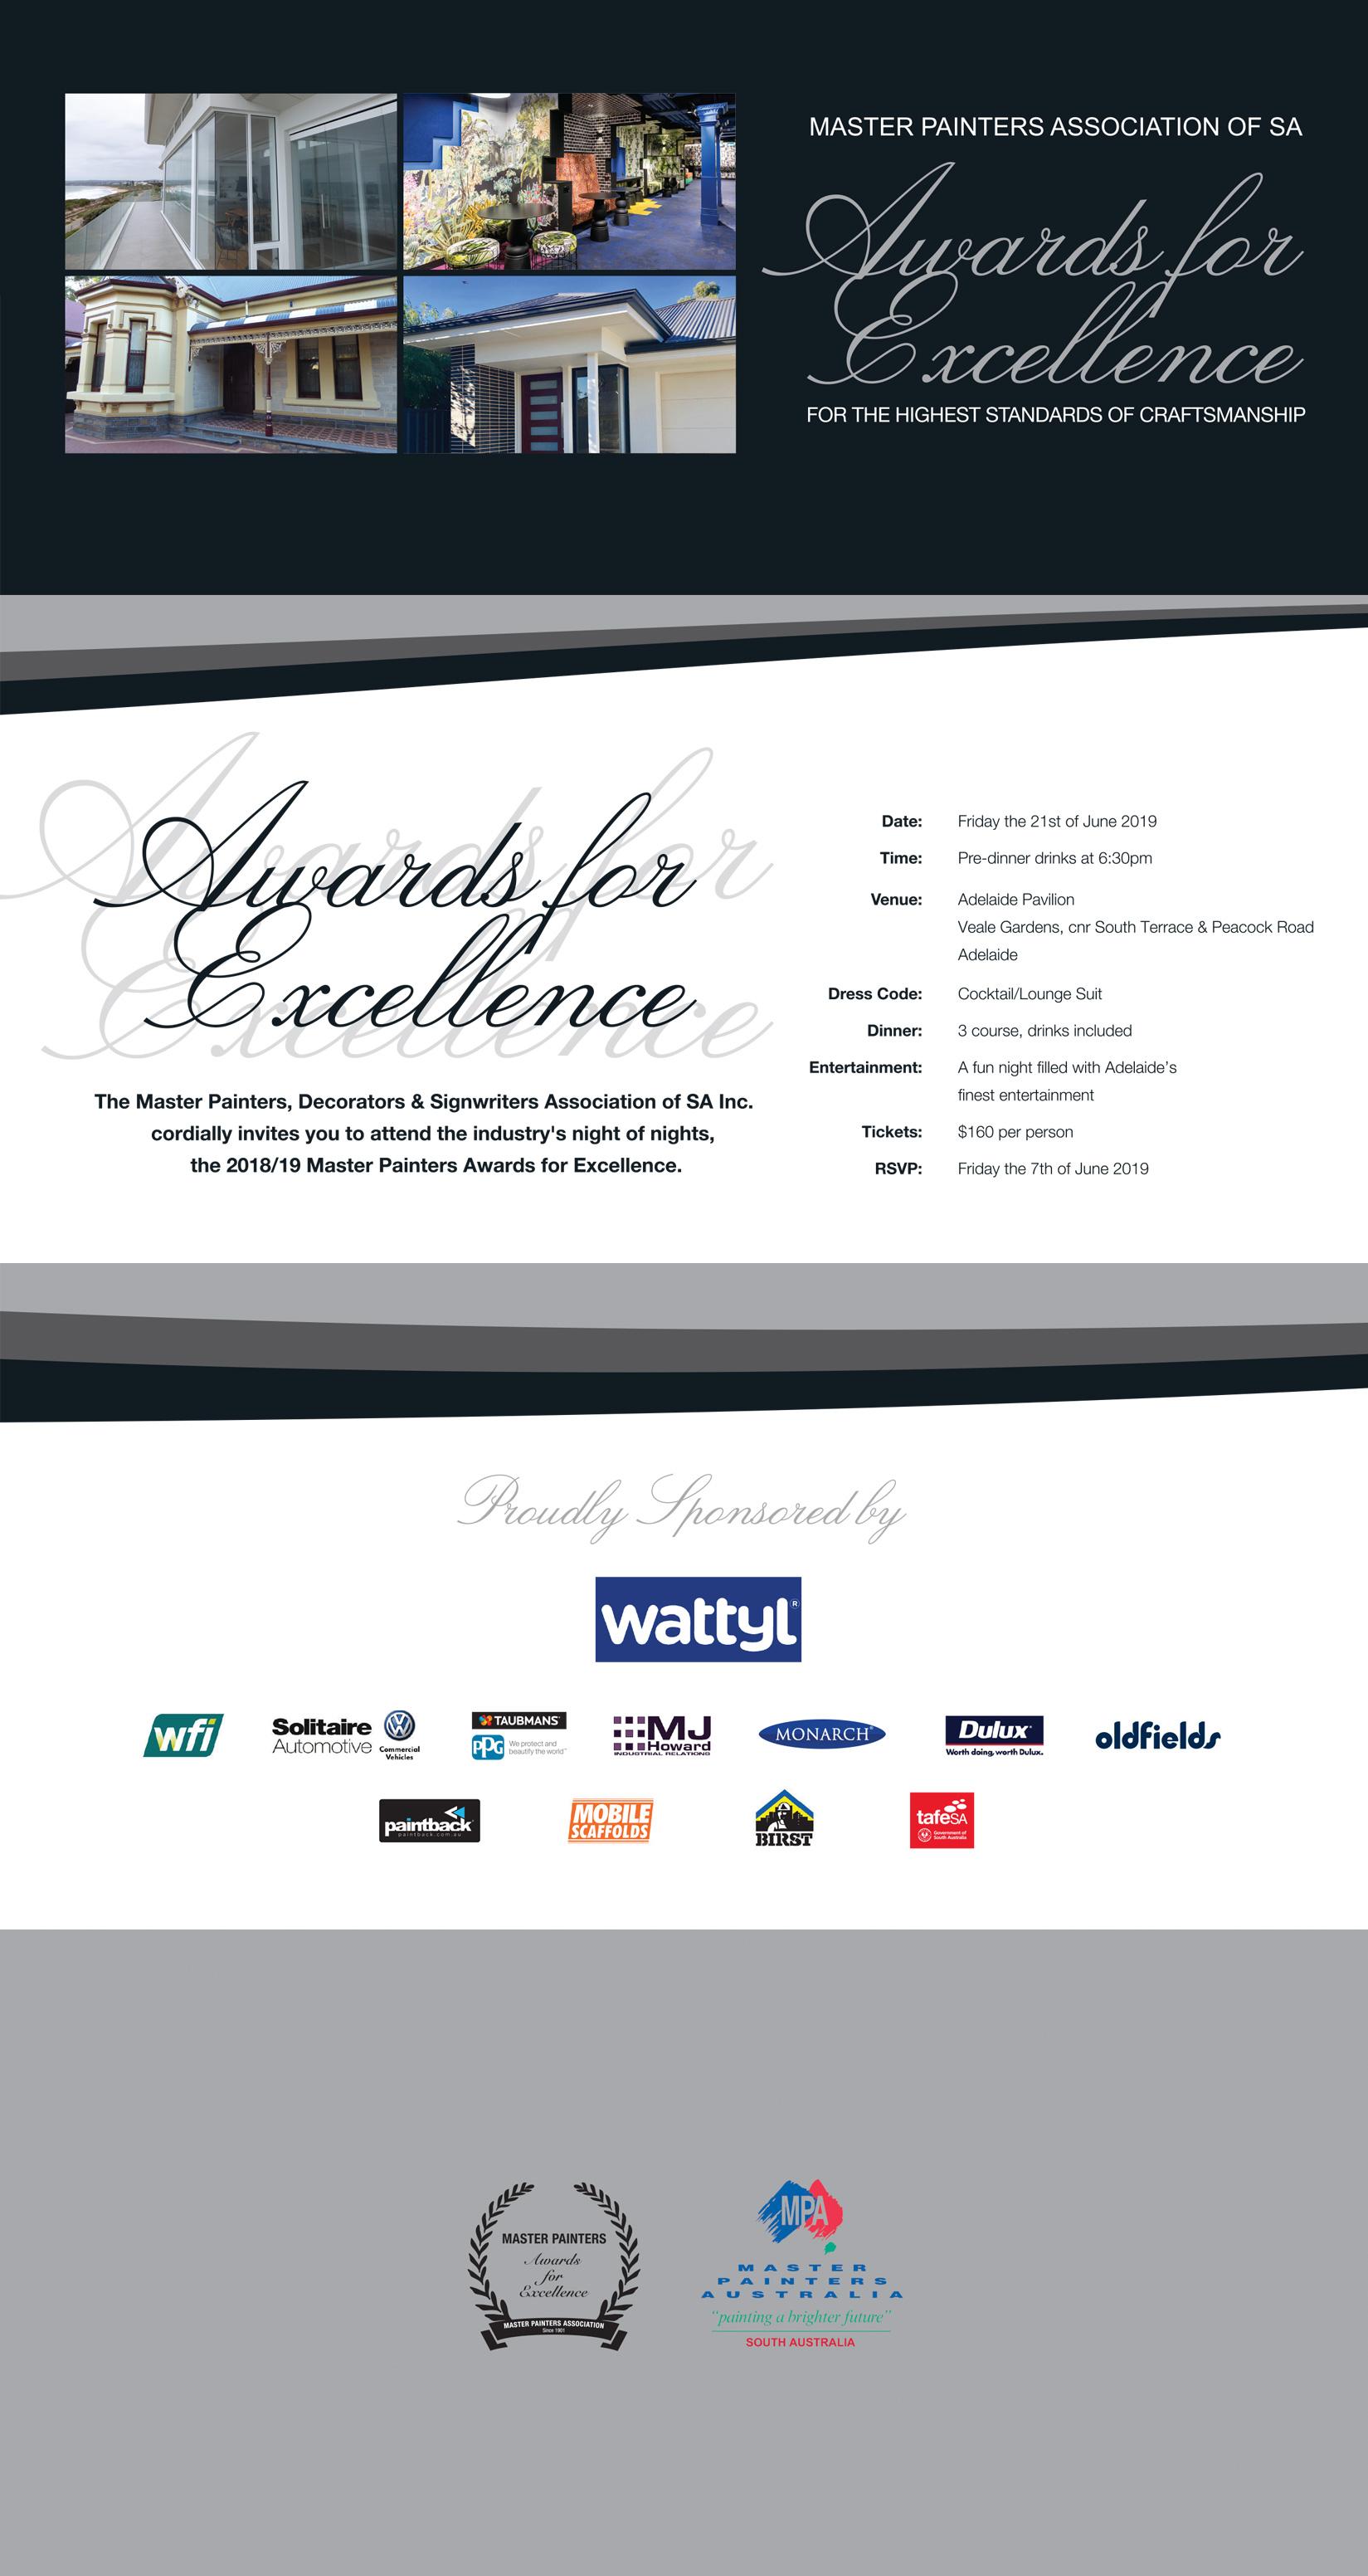 MPA-AwardsforExcellence-2018-Invitation